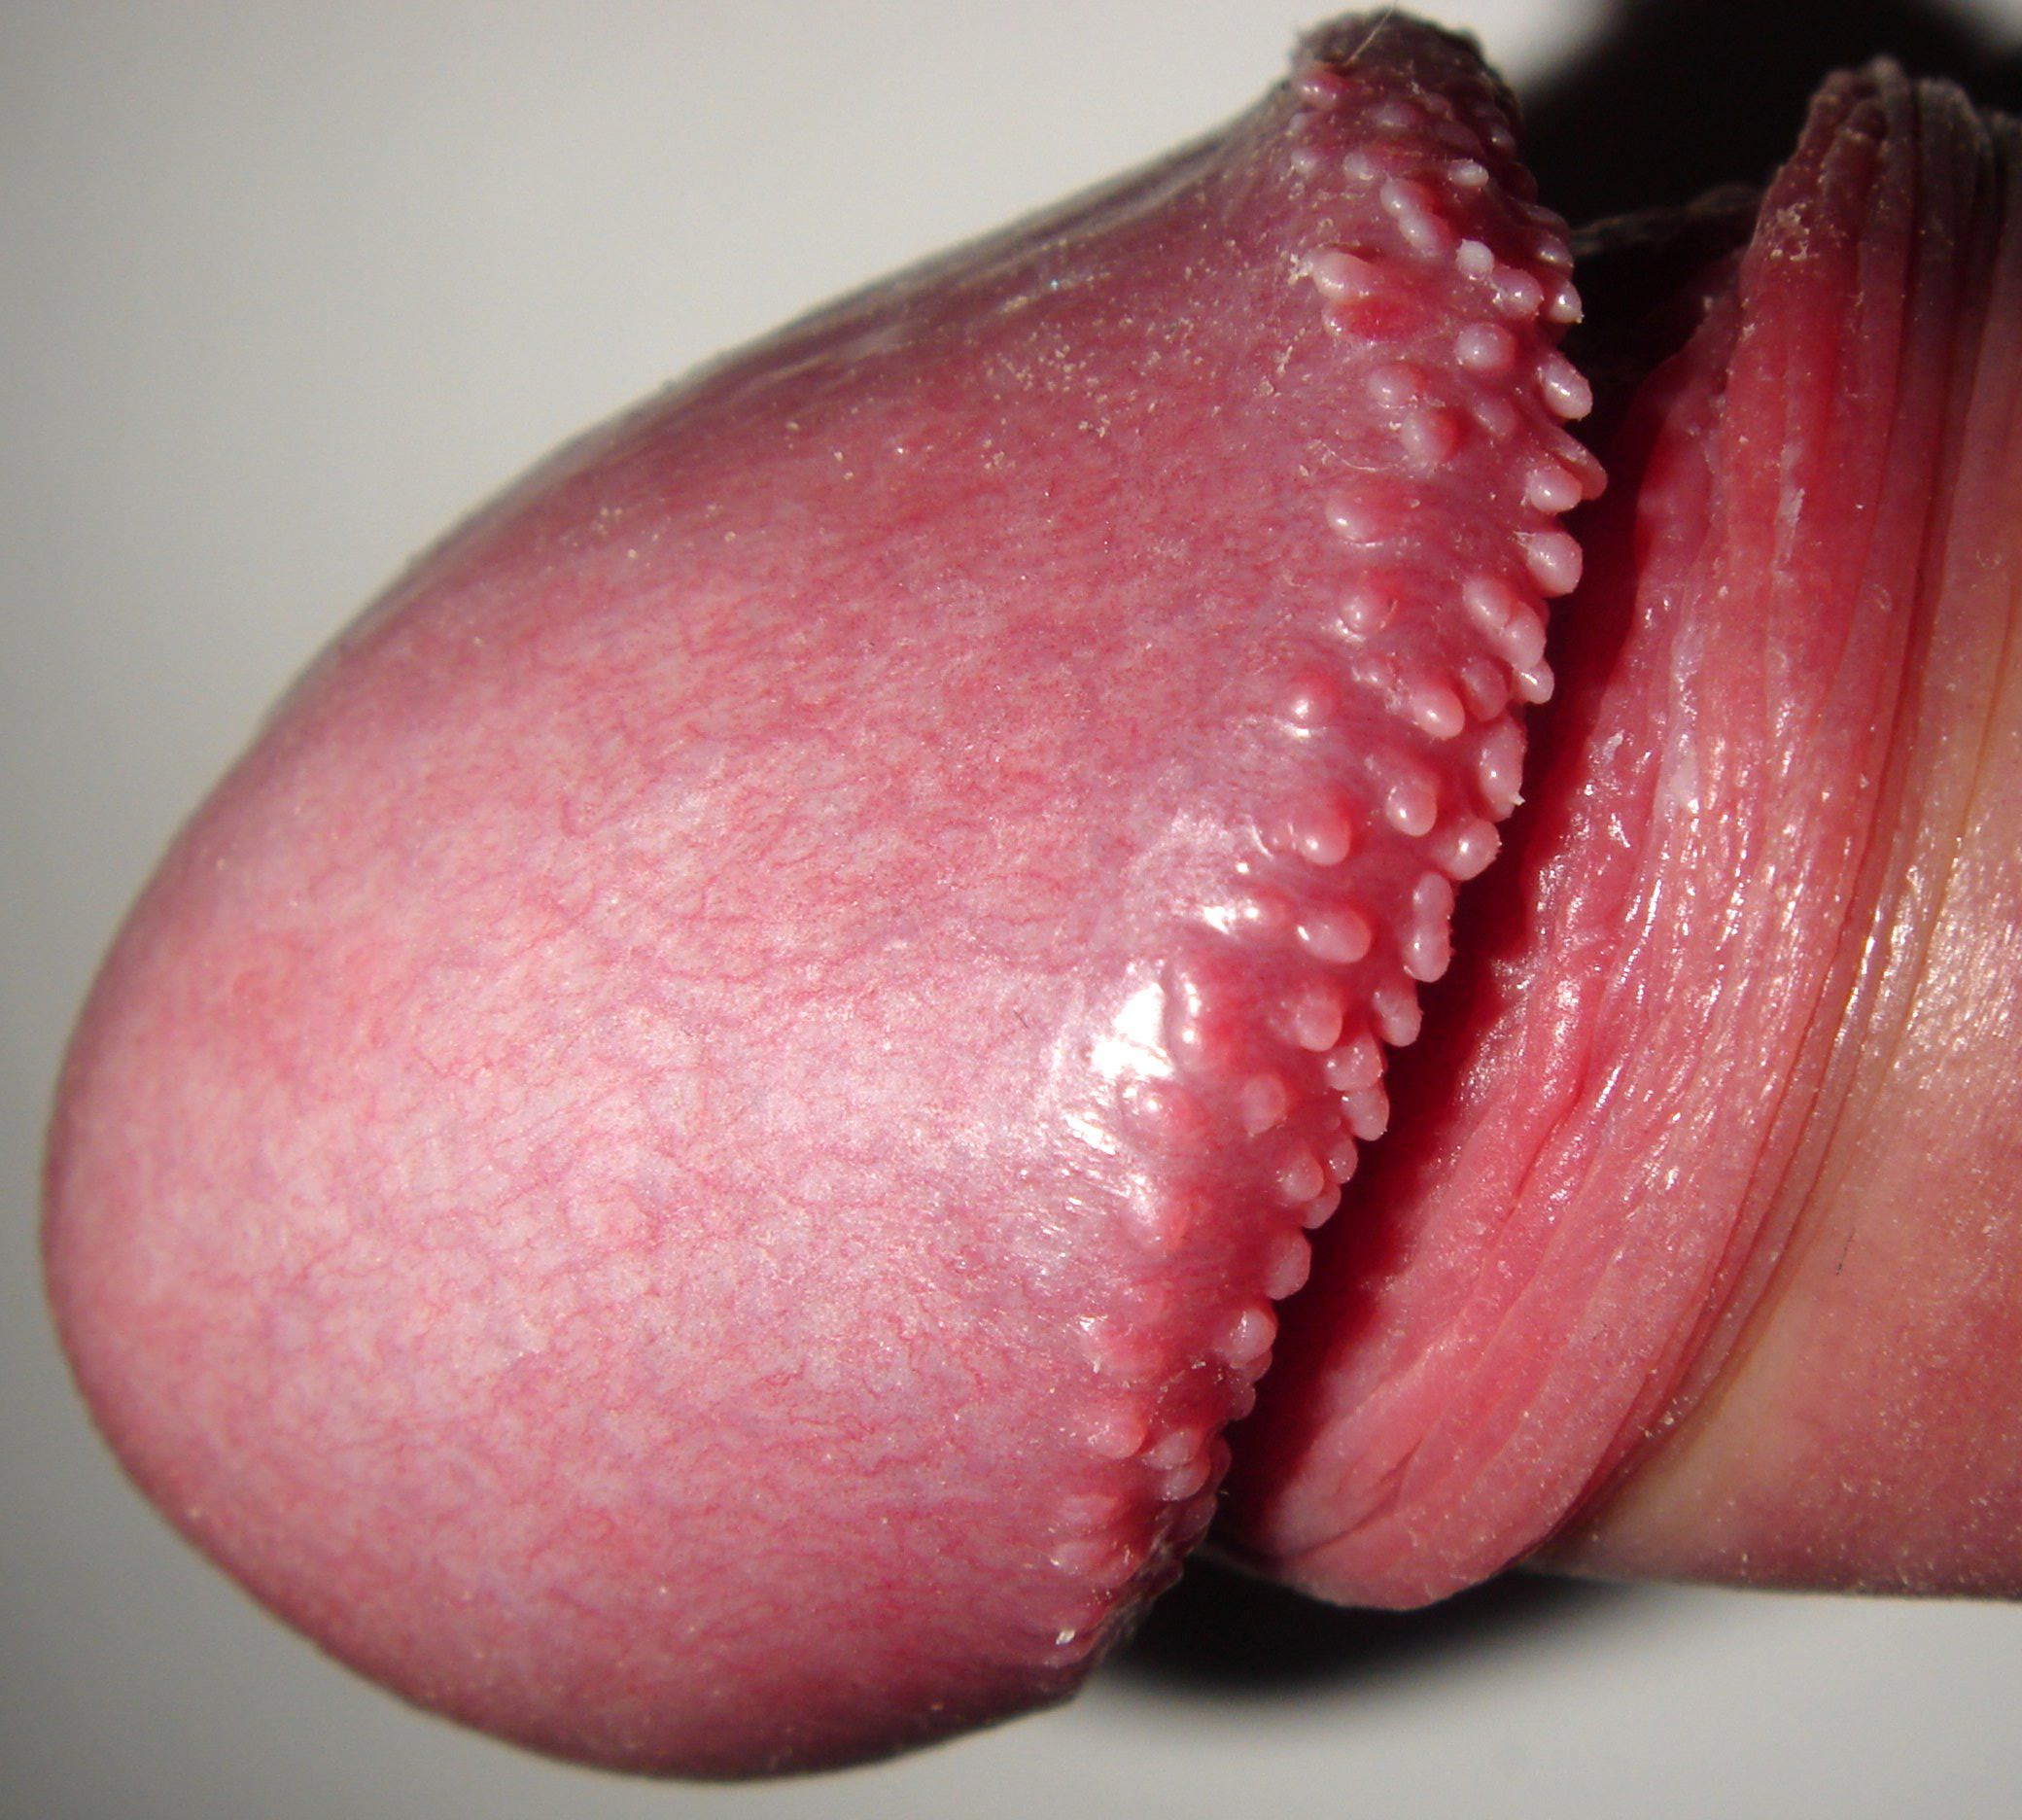 Hpv mouth screening - Subiecte în Cancer